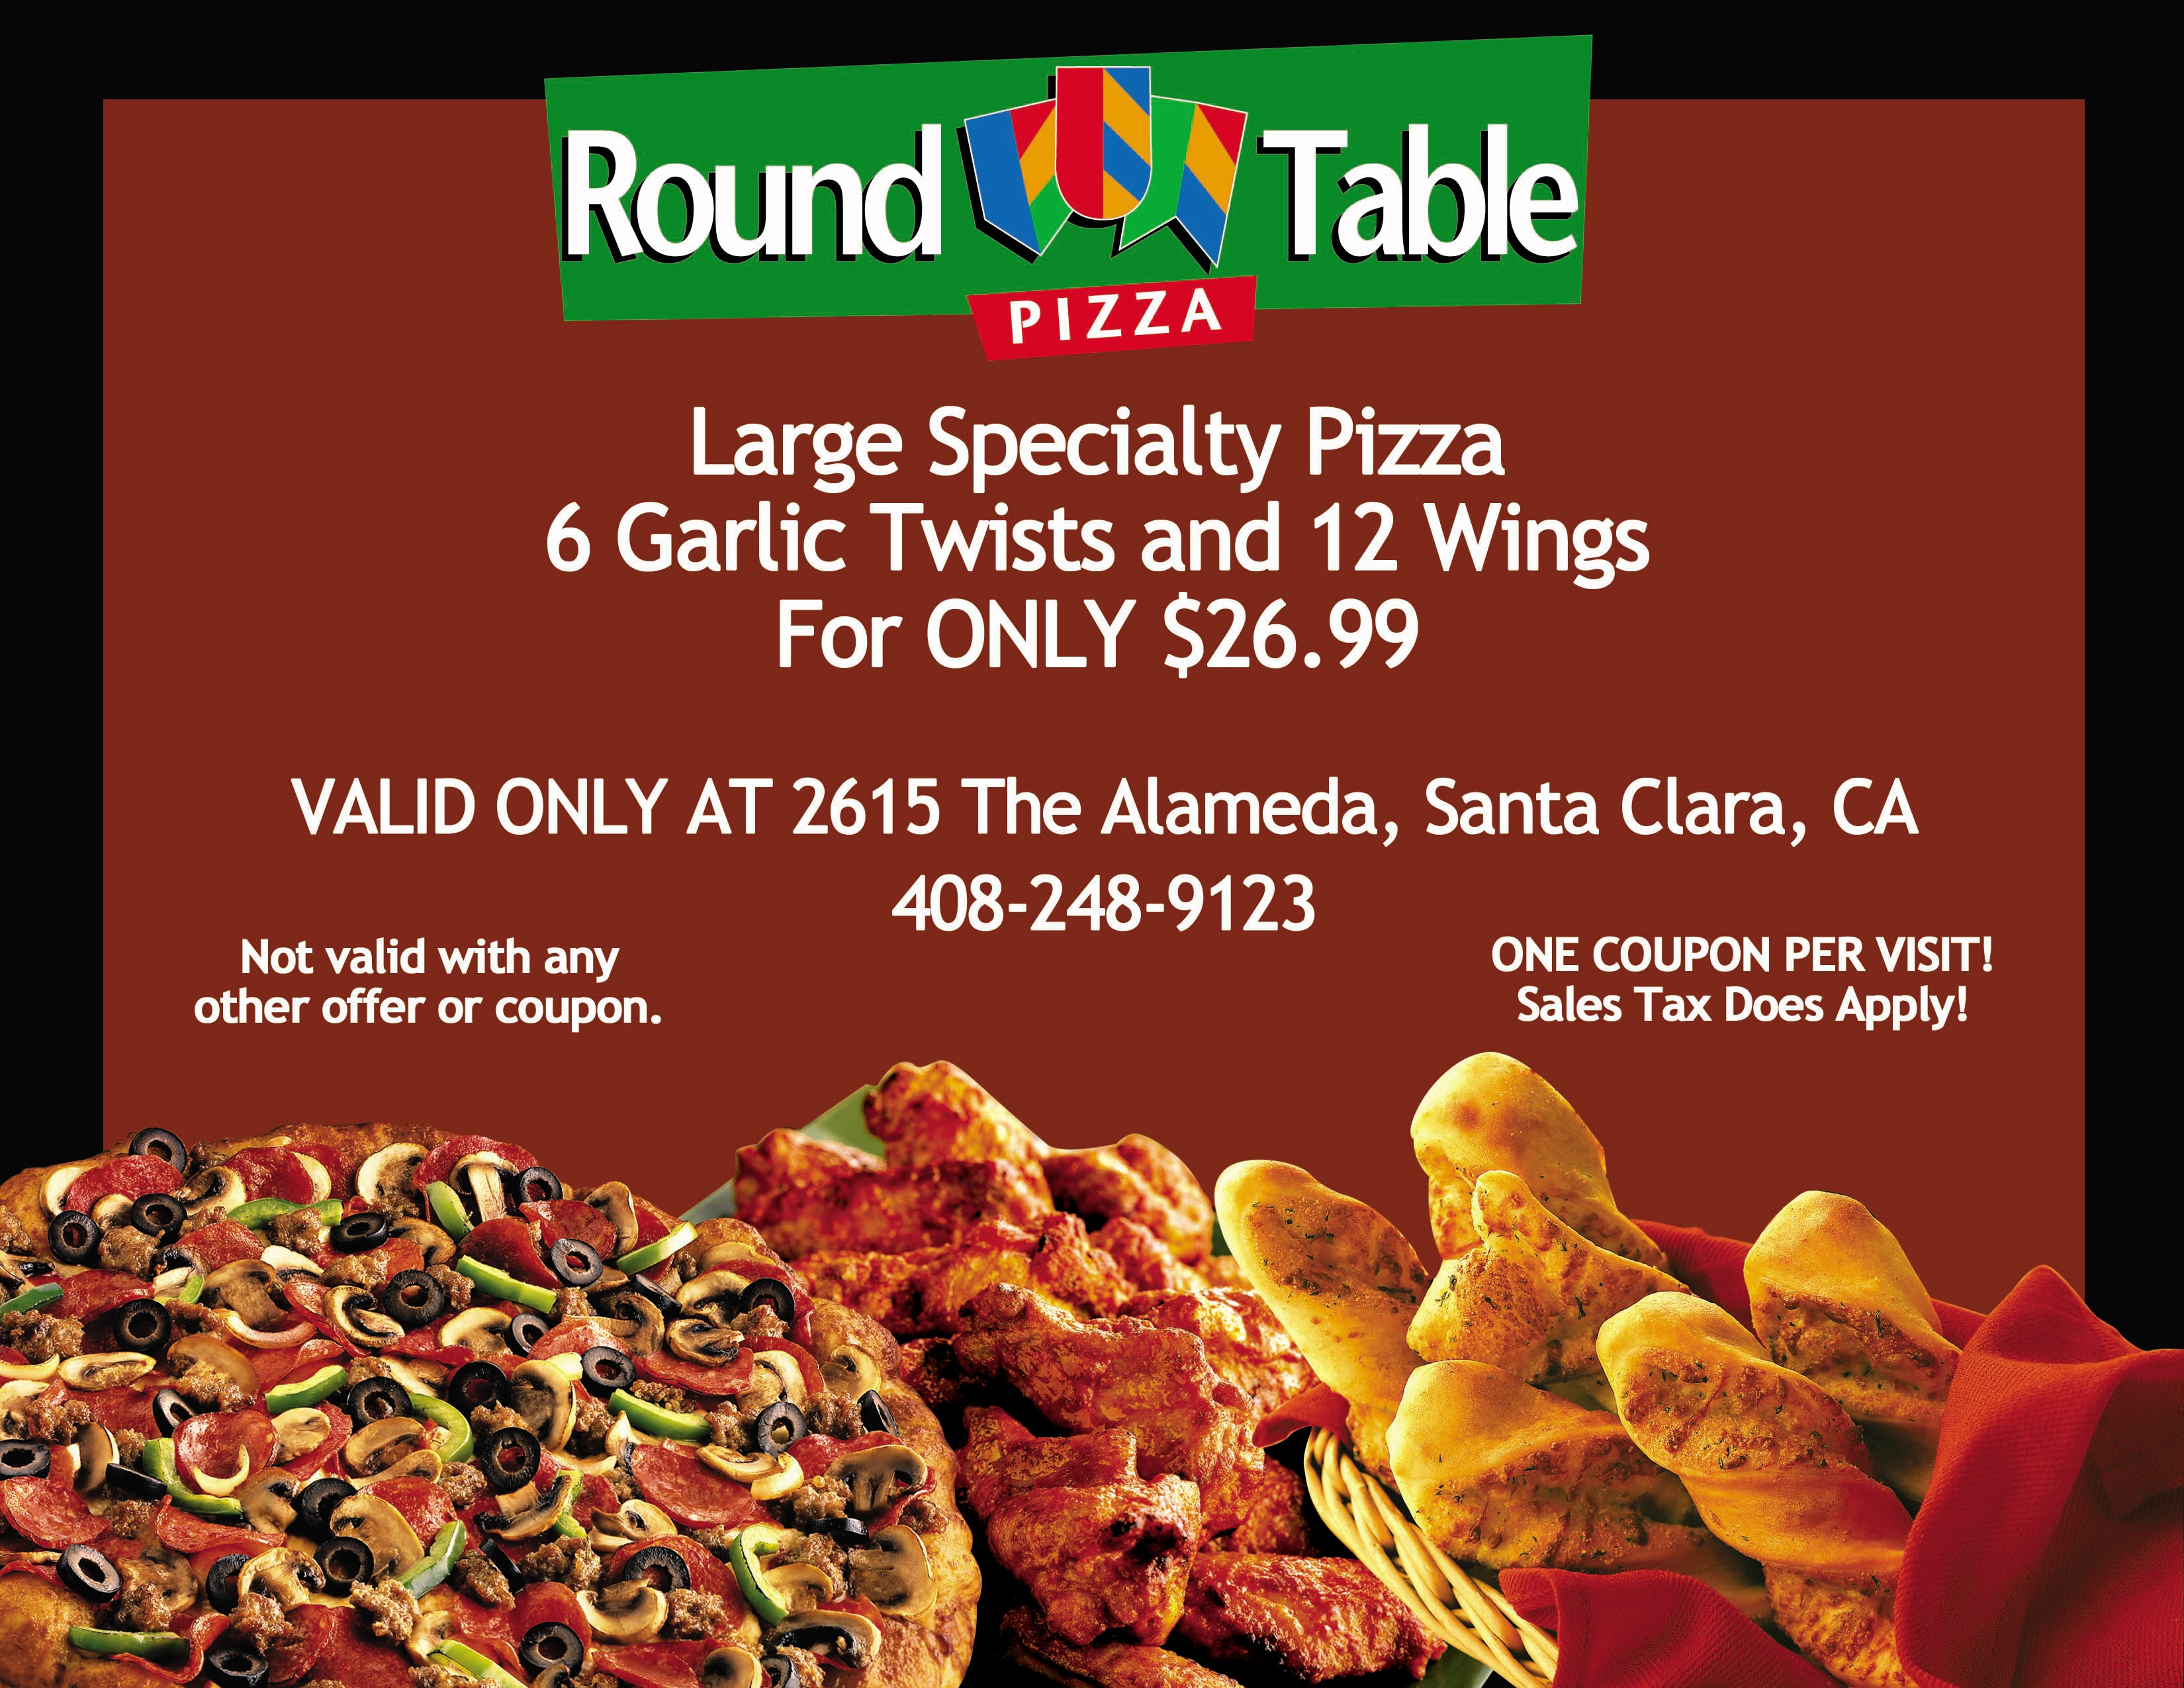 Round Table Buffet Times Lovetousco